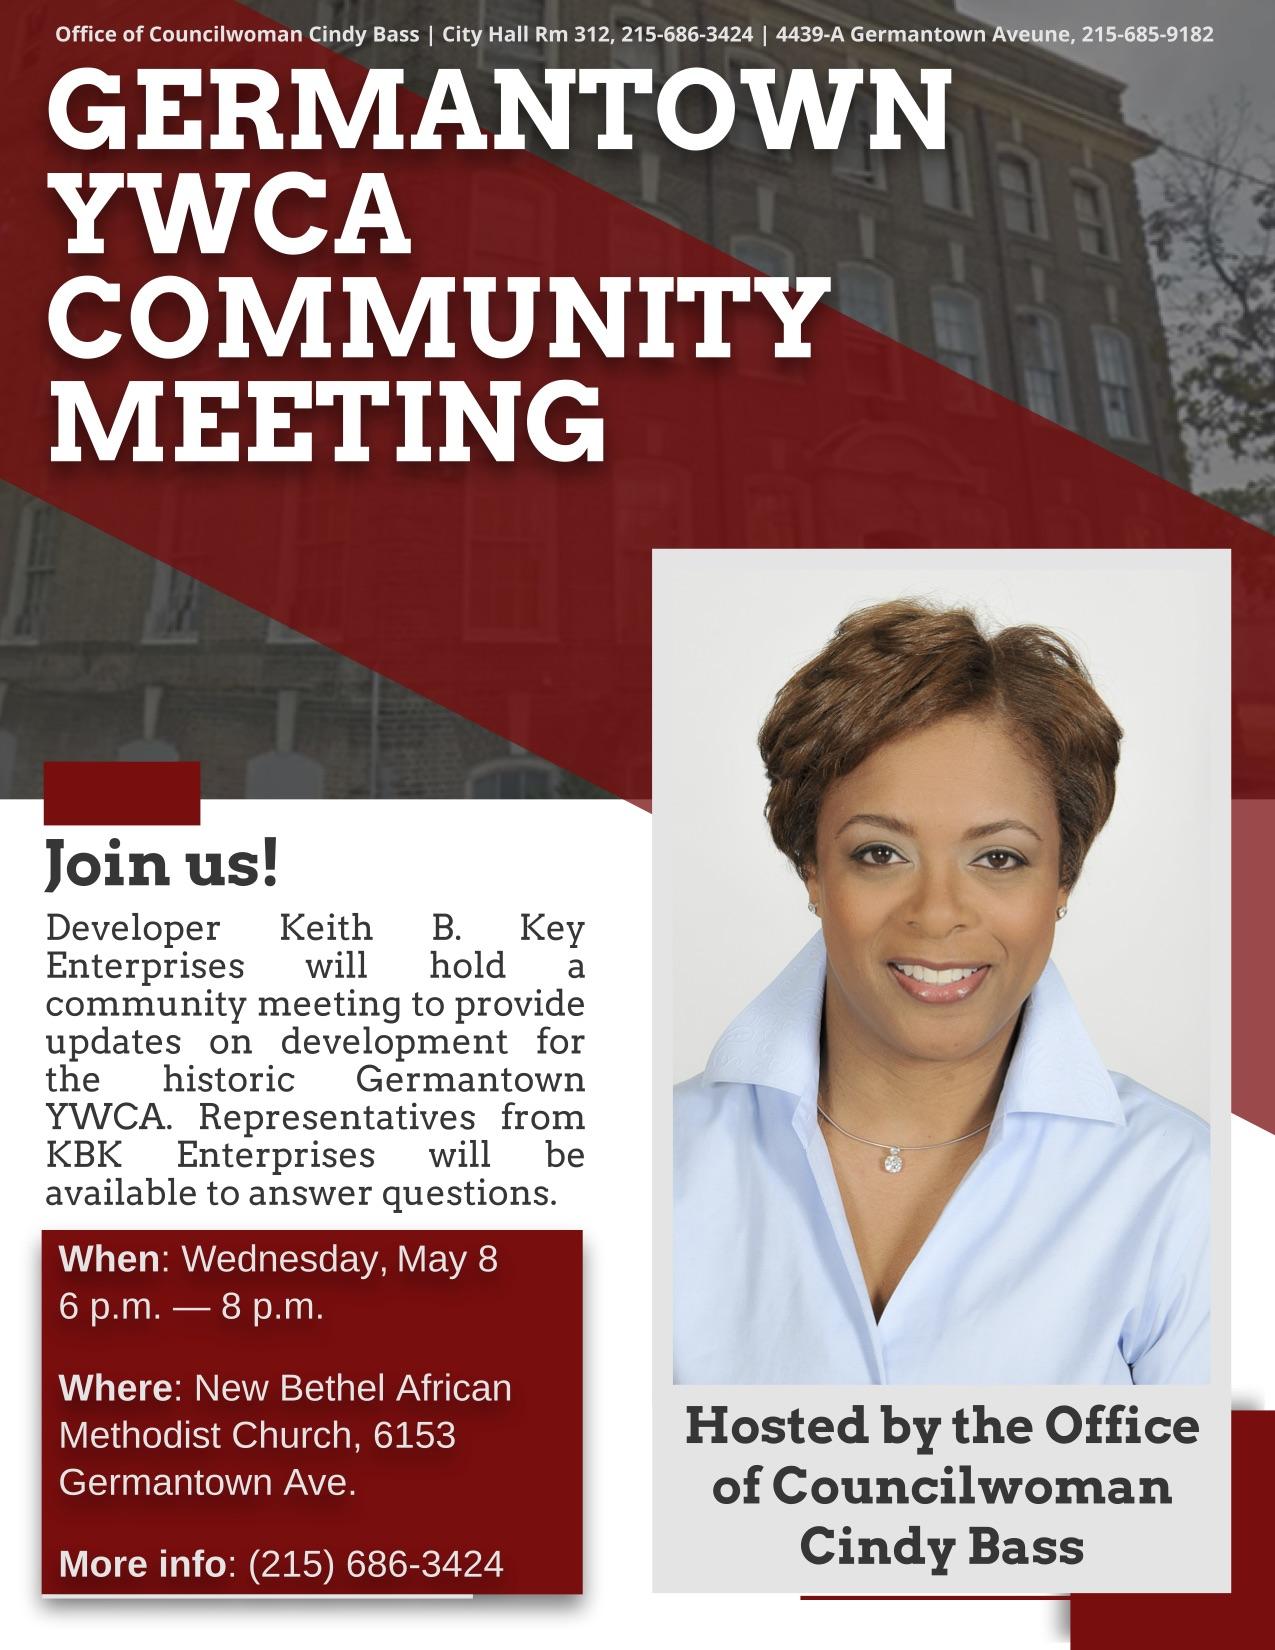 8c947168b969 Development News: Germantown YWCA Community Meeting May 8